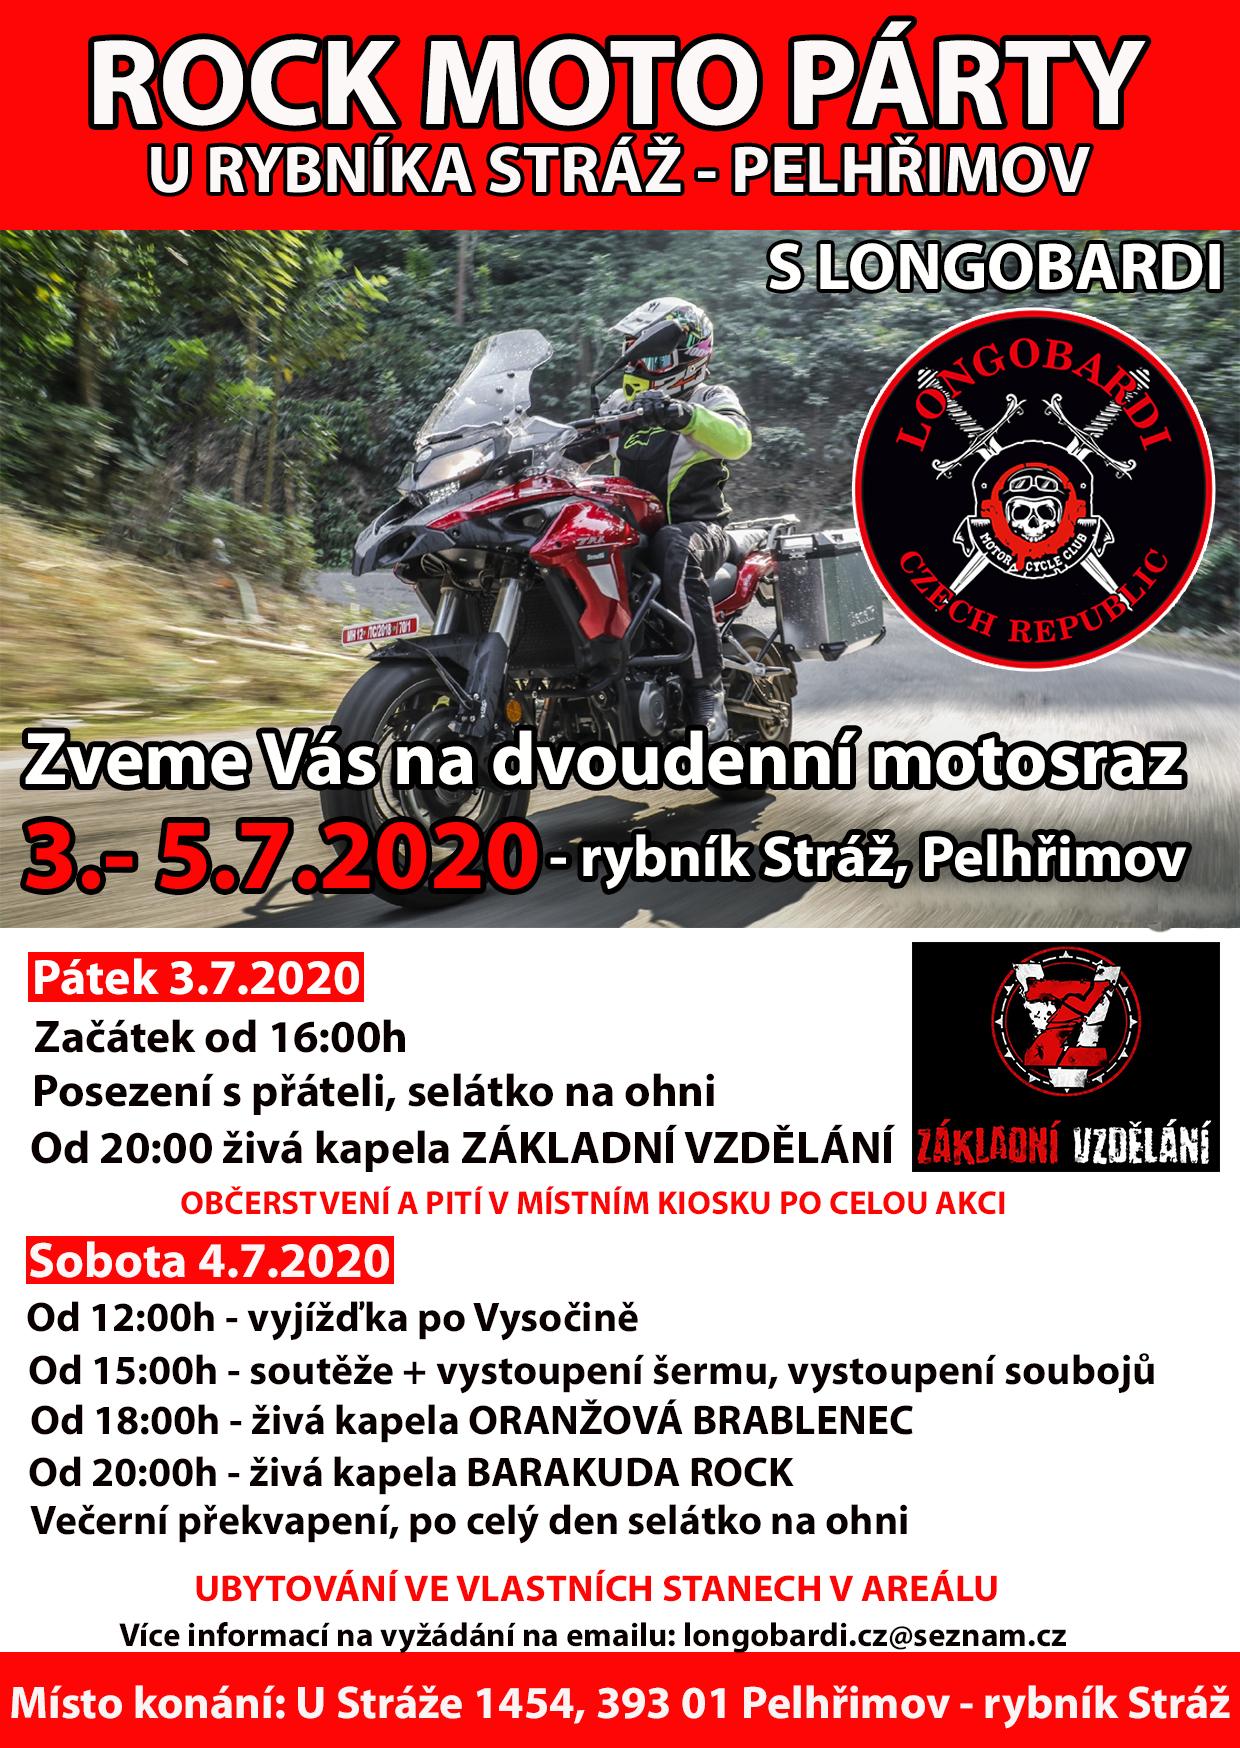 Pozvánka na motosraz 3.-5.7.2020 - Pelhřimov, rybník Stráž